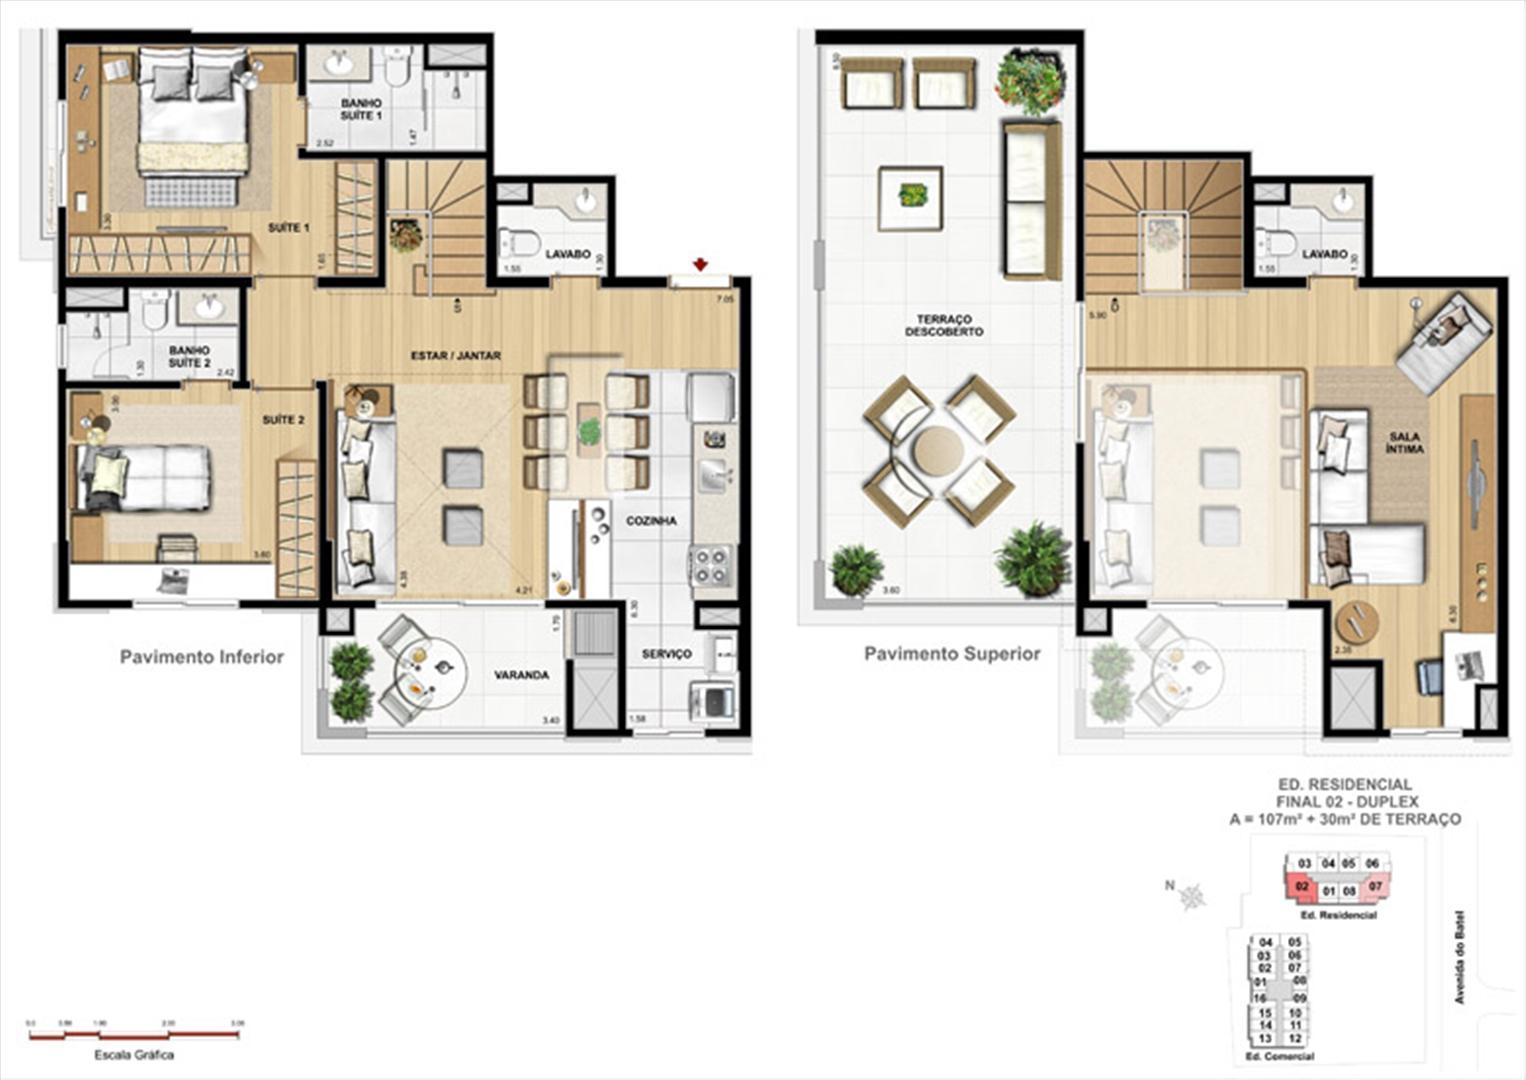 Apartamento 2 Suítes Duplex | 1550 Batel (Home Batel) – Apartamento no  Batel - Curitiba - Paraná